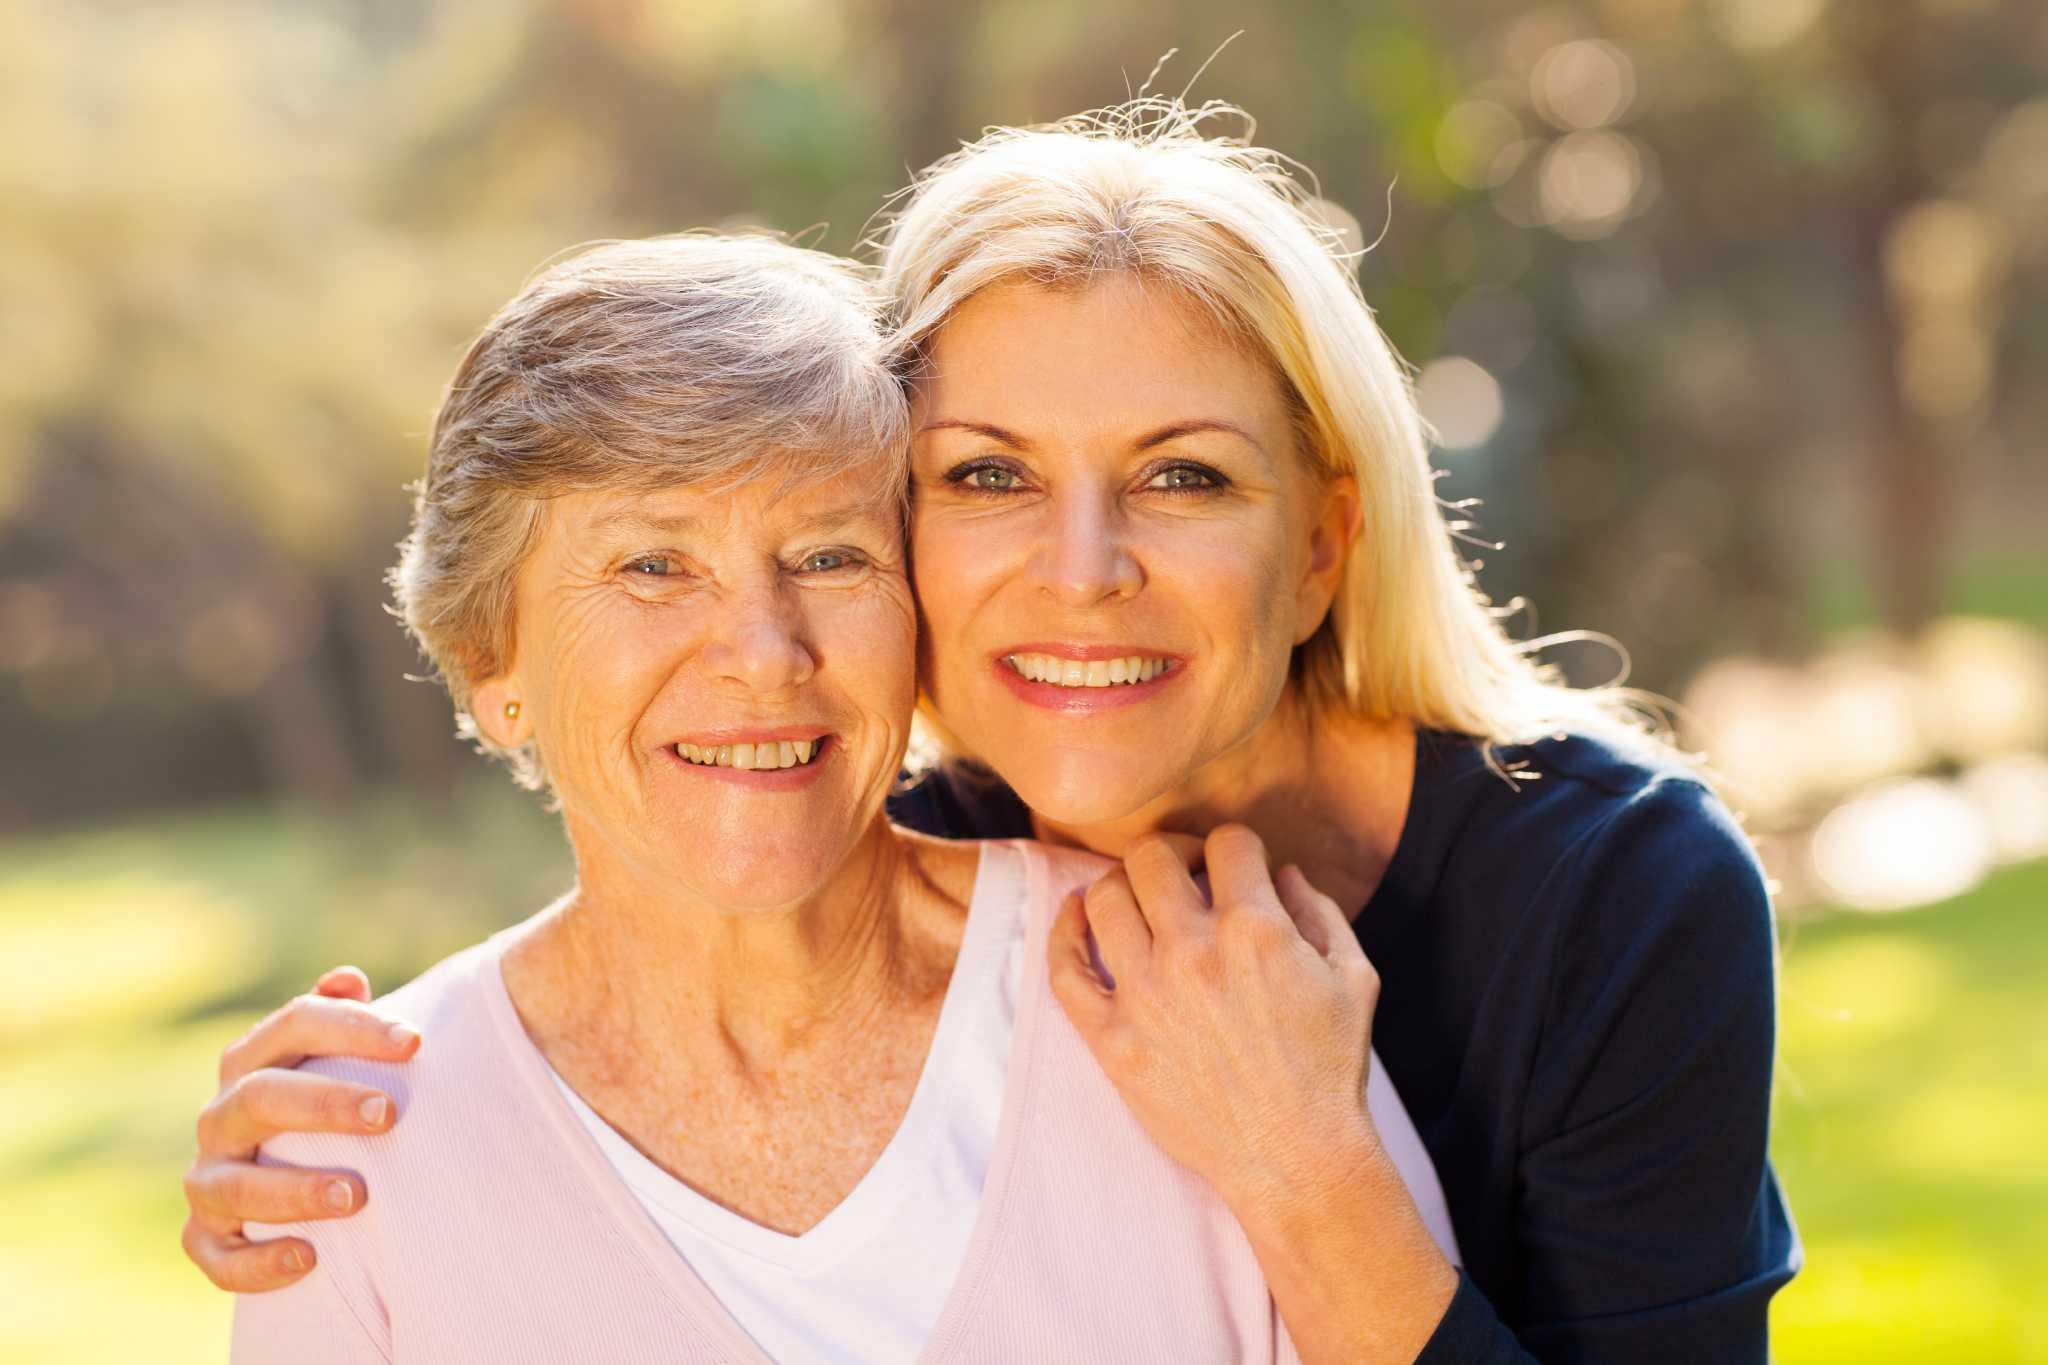 Senior women images, stock photos vectors